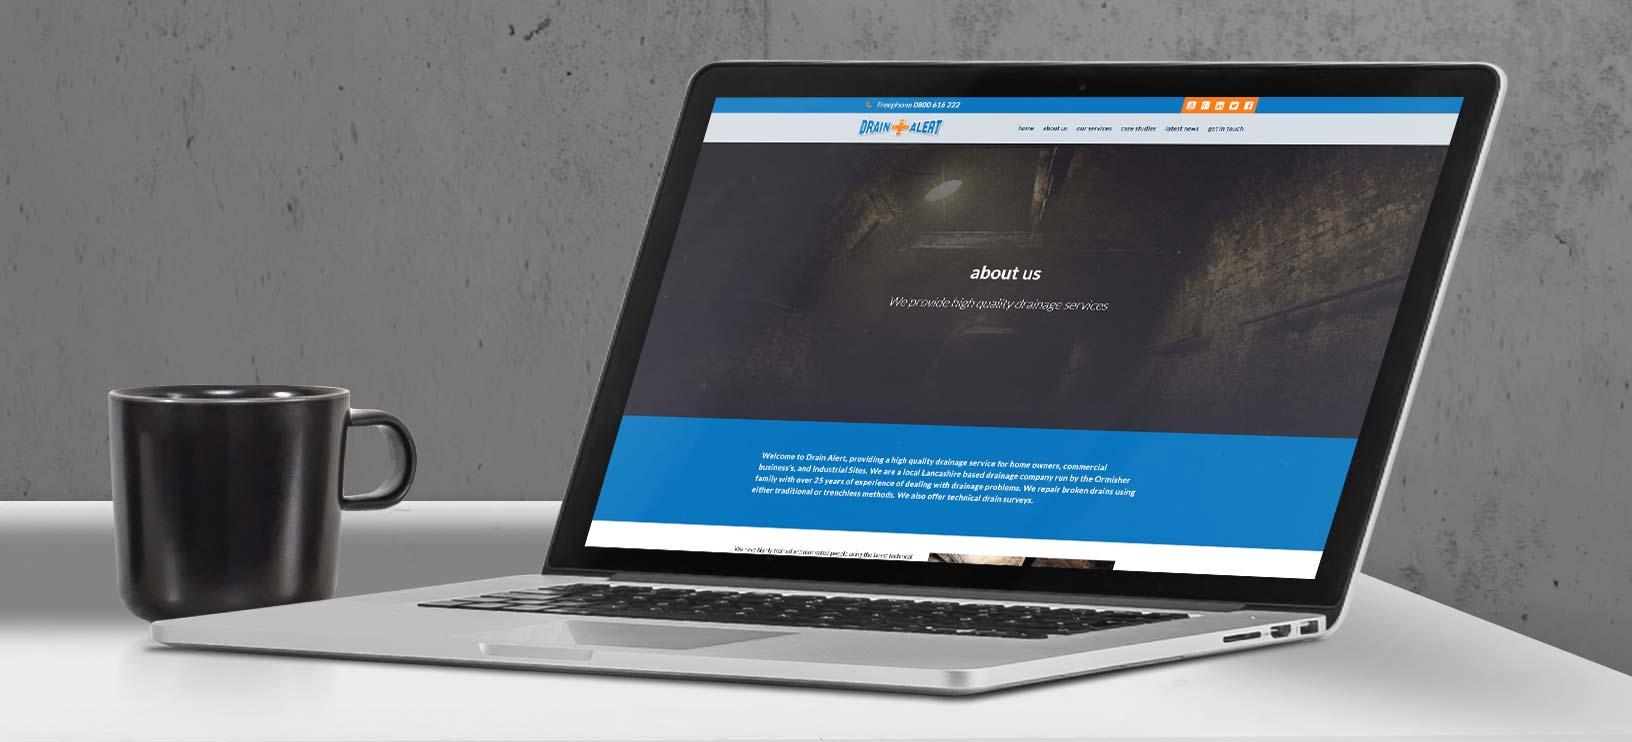 Drain Alert | Responsive Website Design